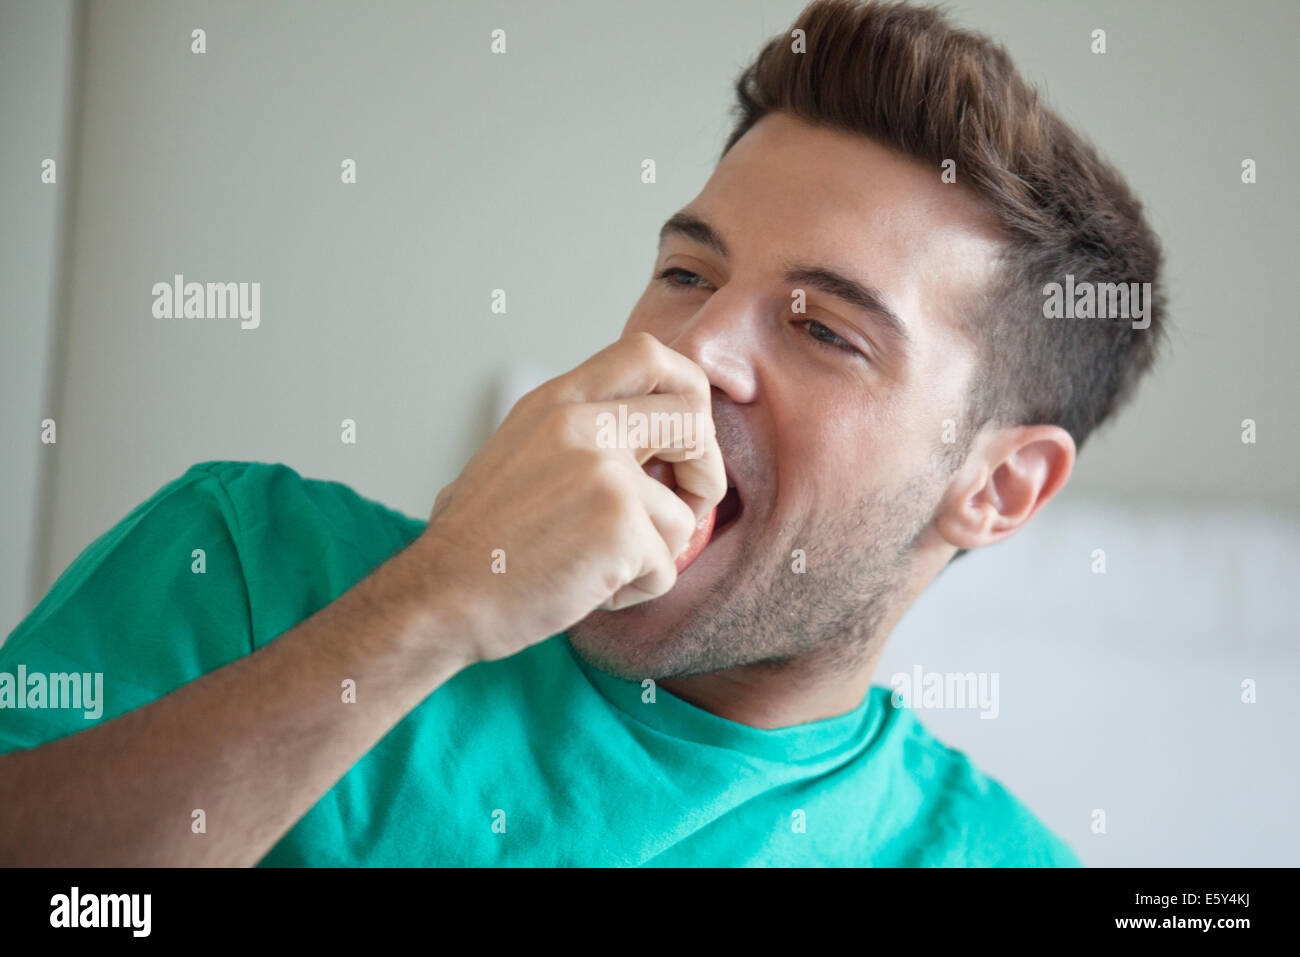 Man eating apple Photo Stock